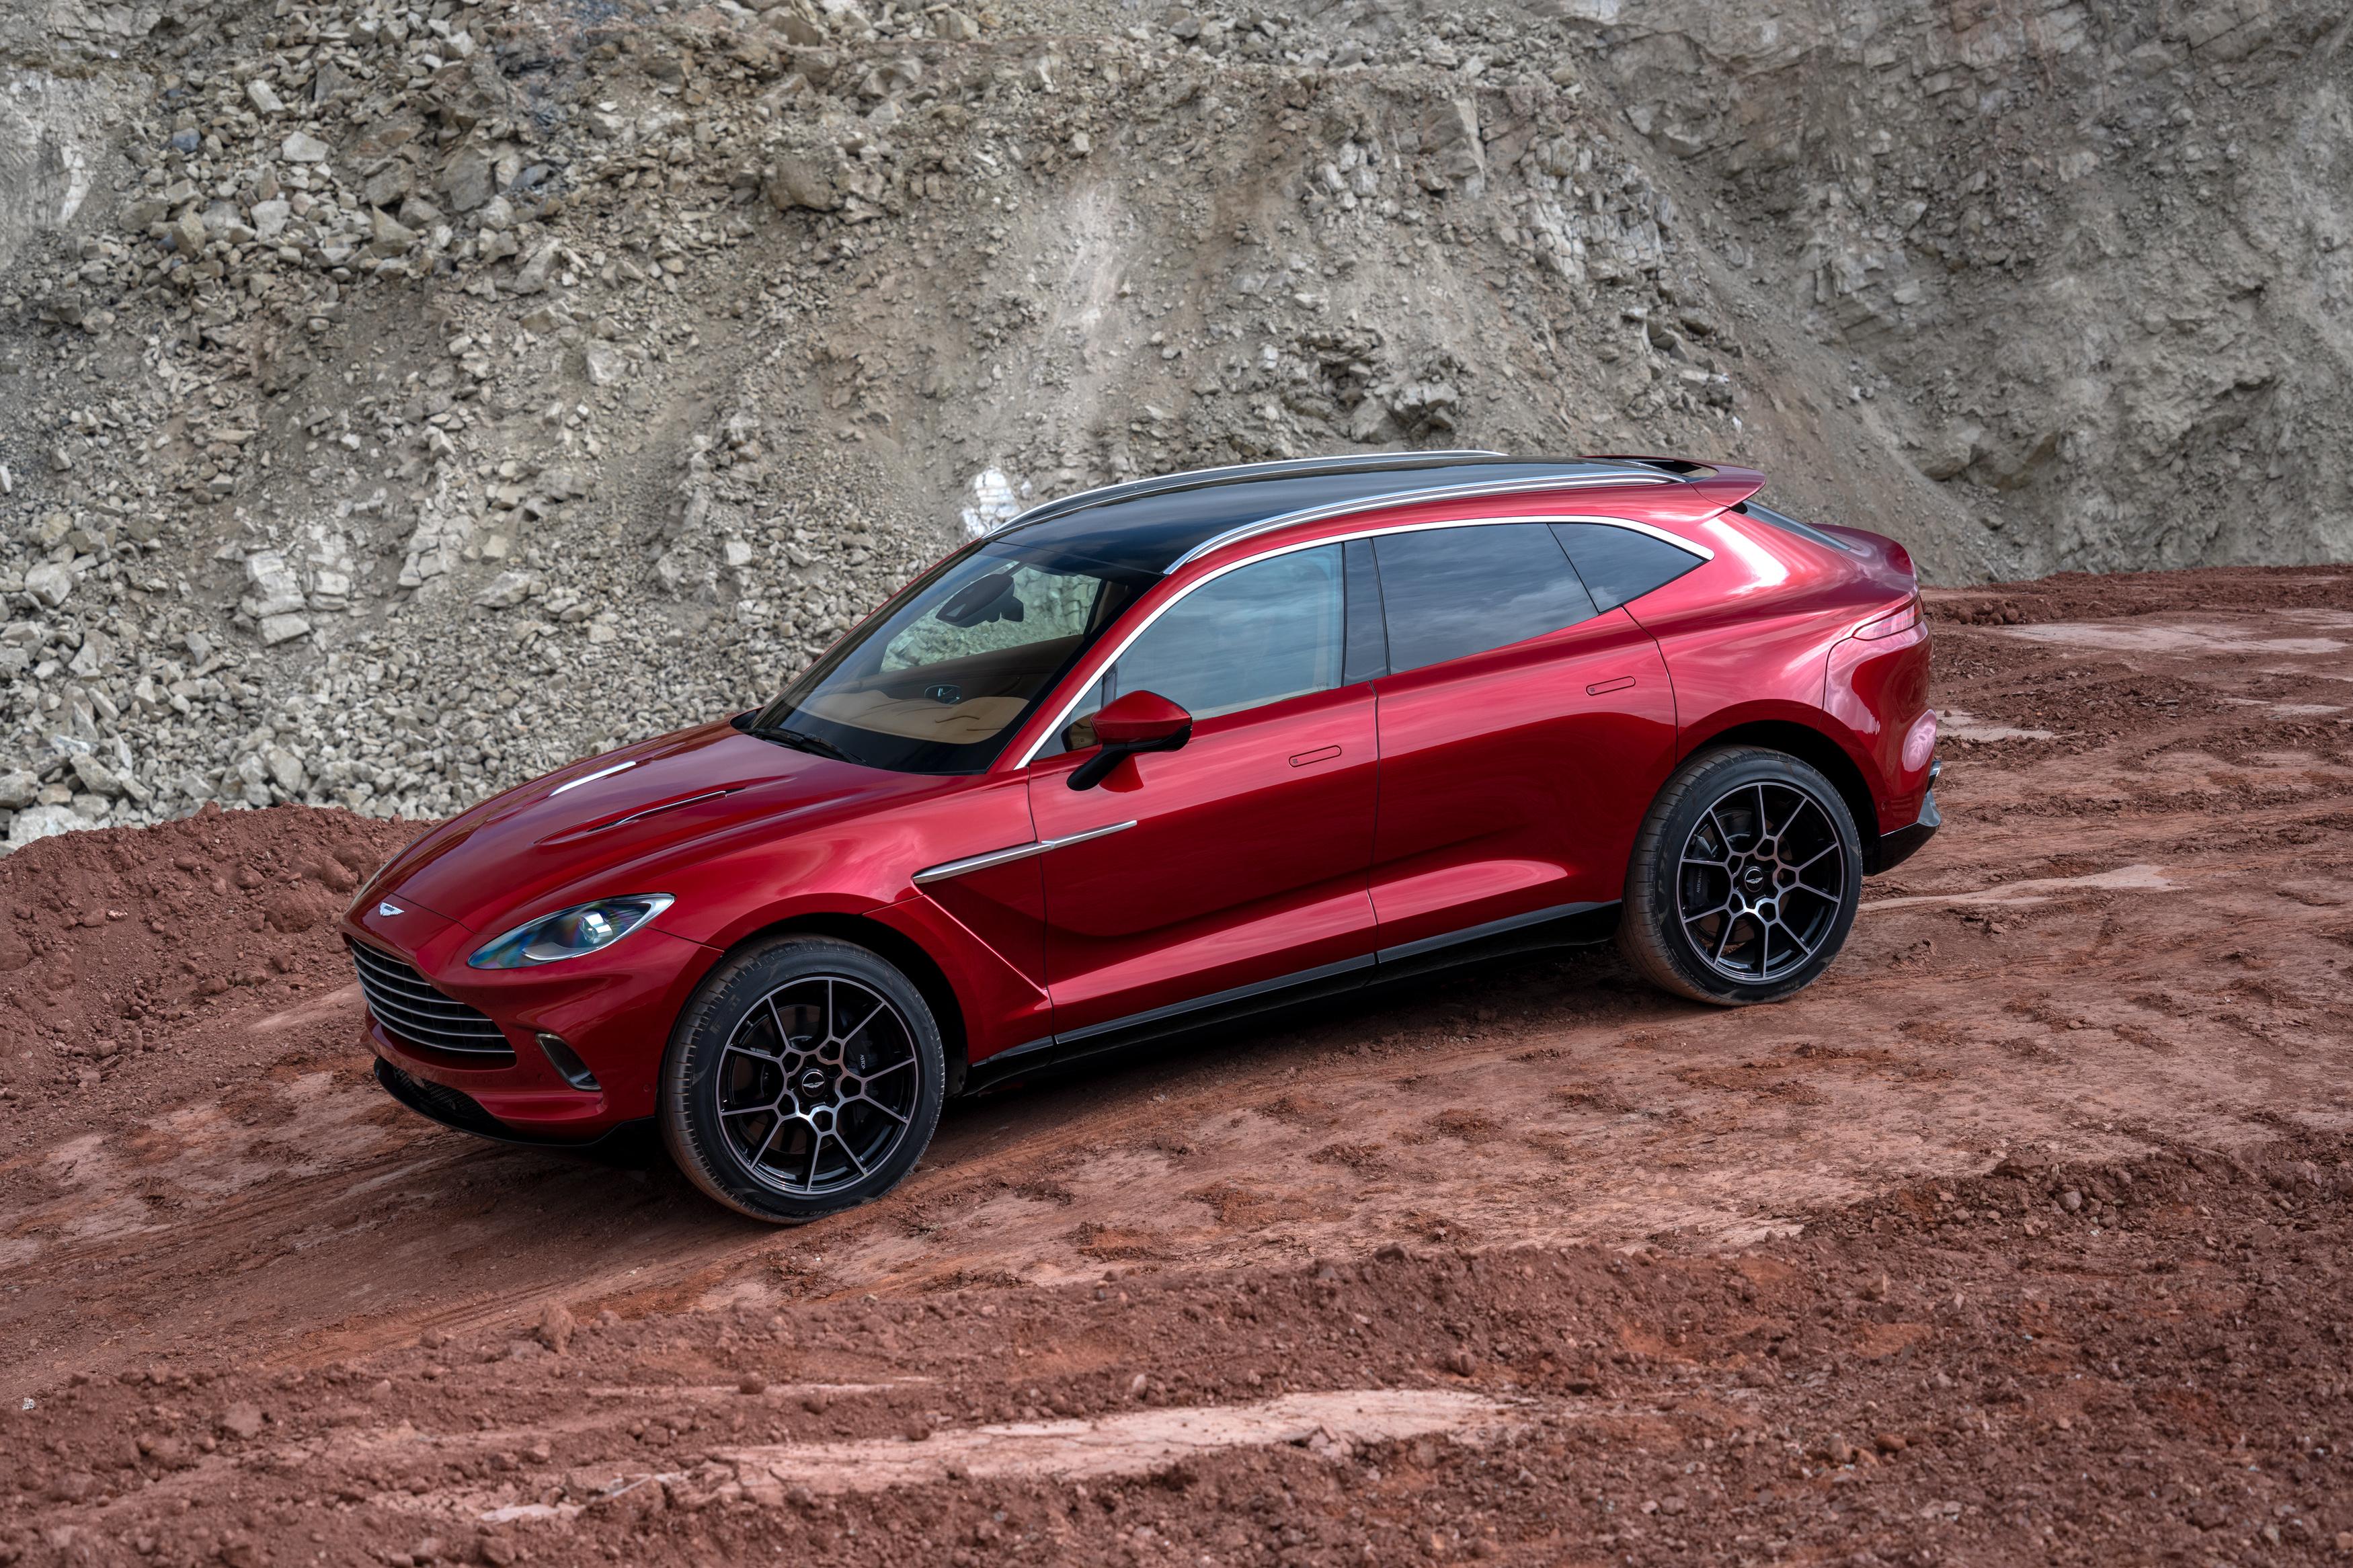 Aston Martin Reveals Its First Suv Cnn Video